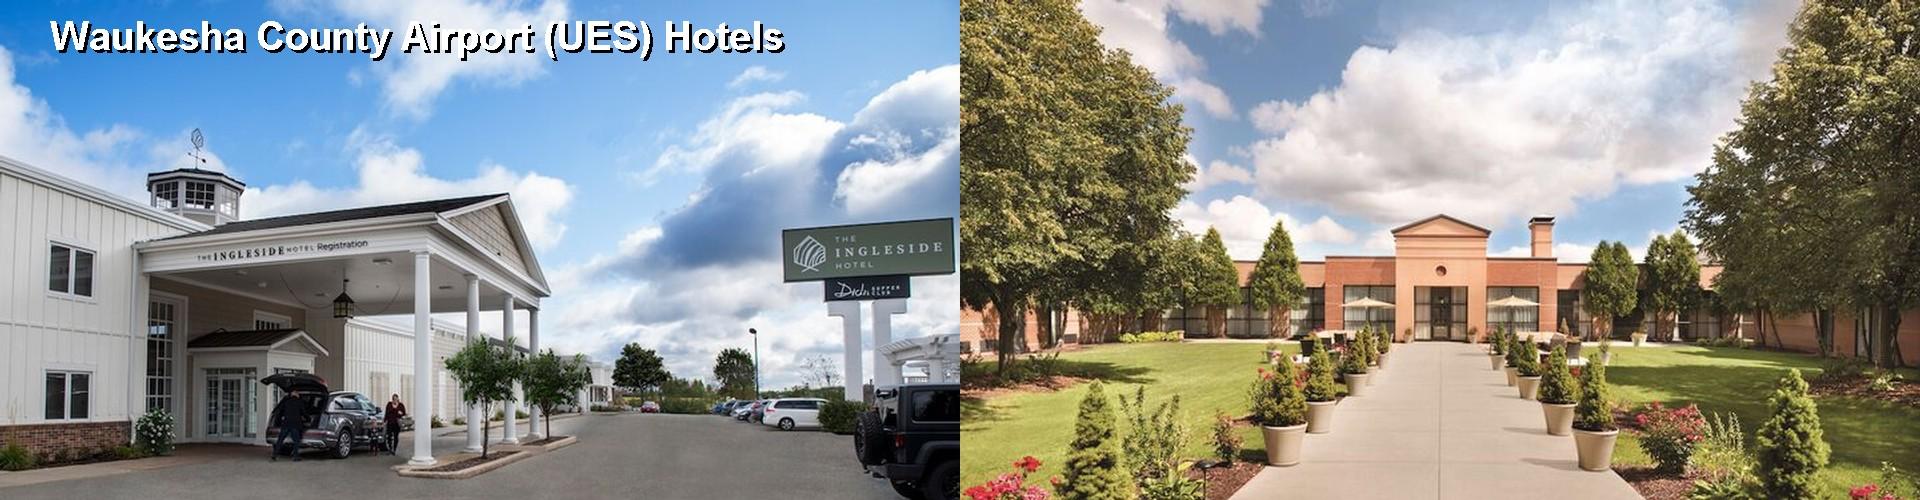 5 Best Hotels Near Waukesha County Airport Ues